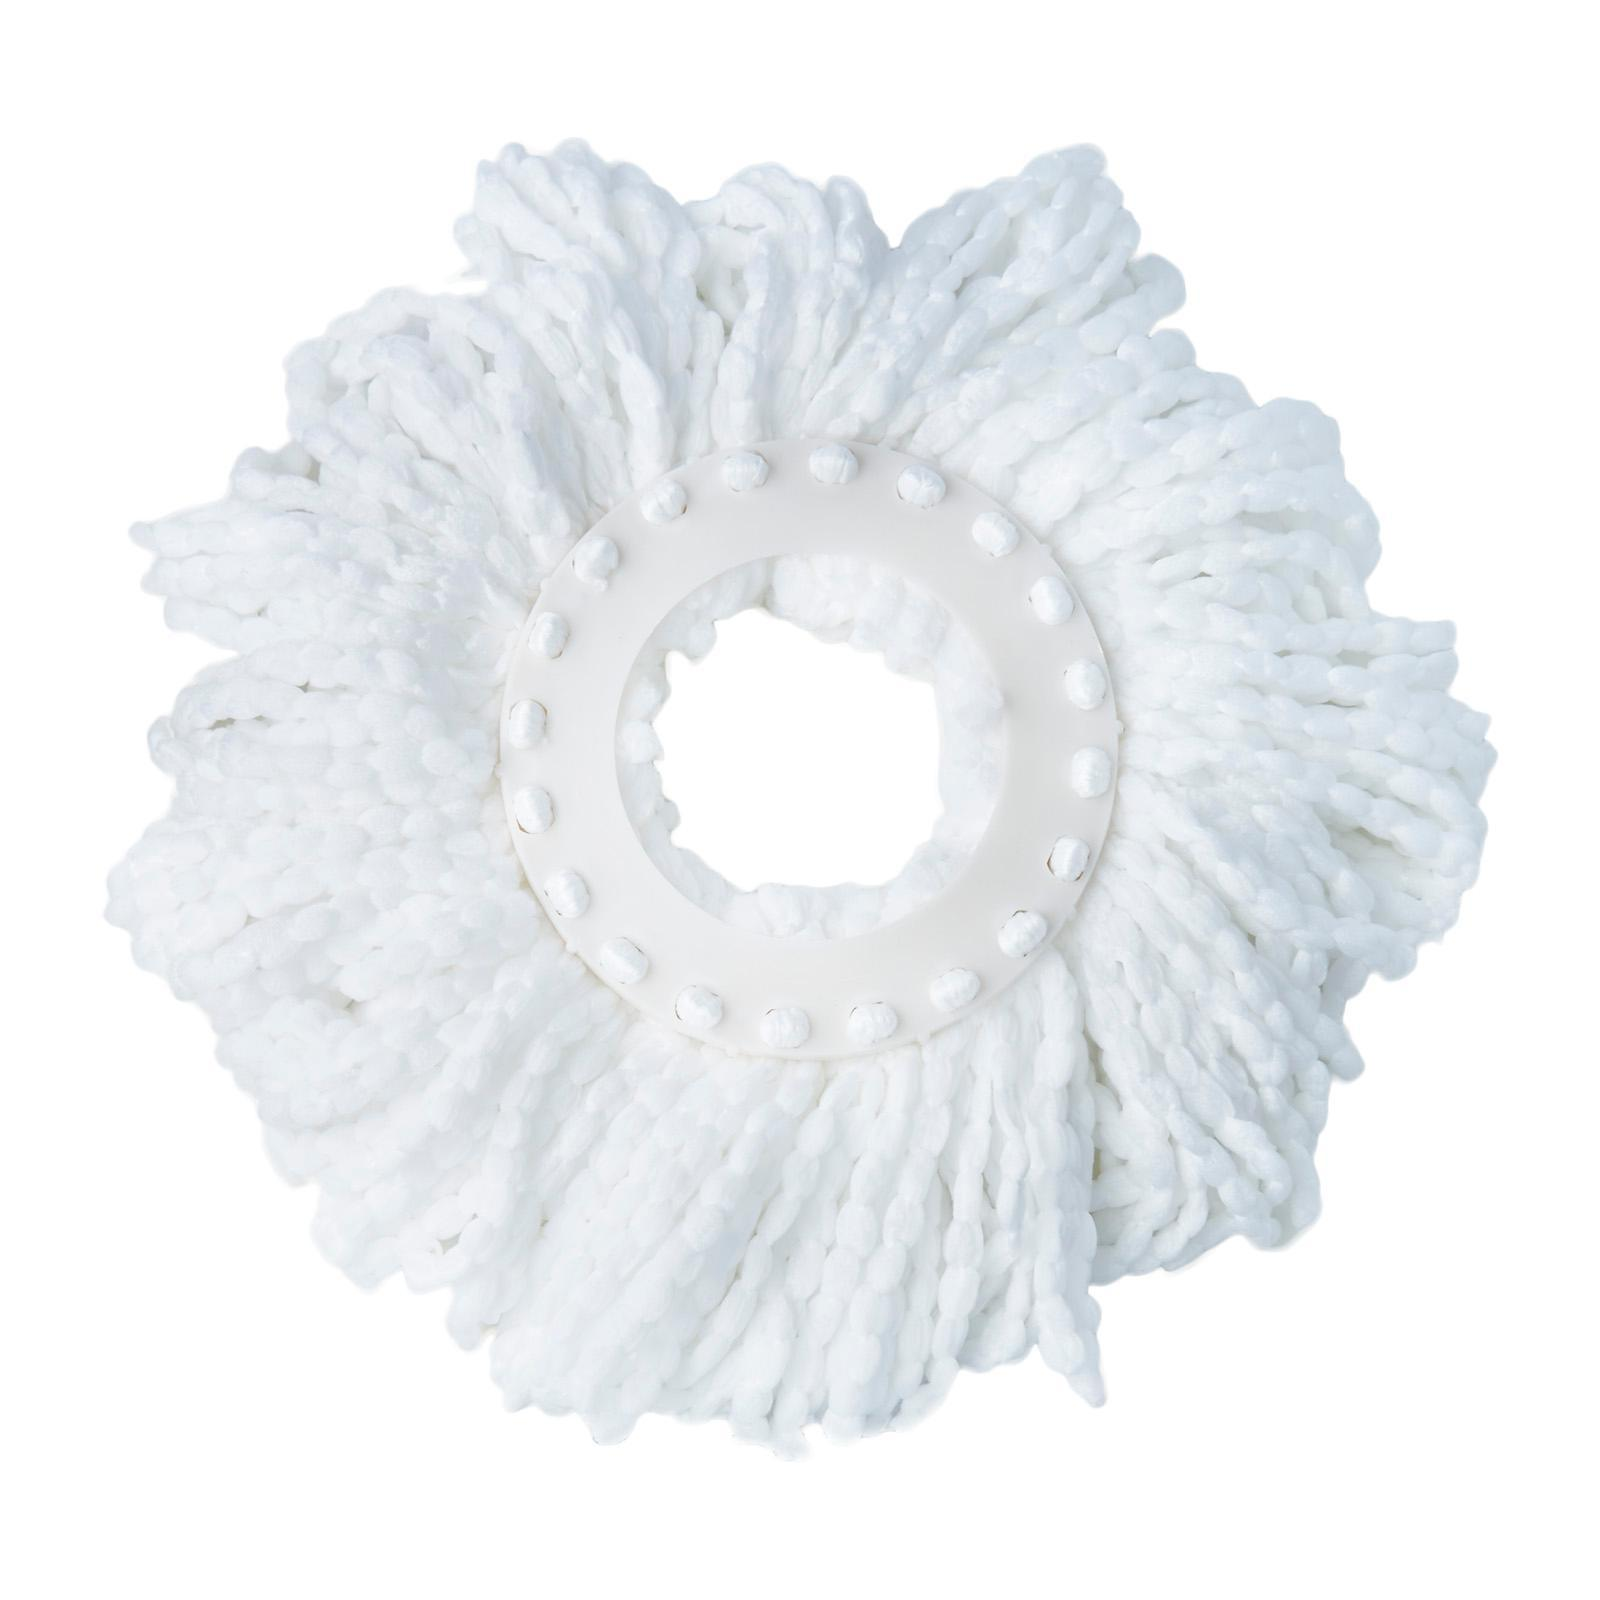 Sunki Spin Mop Microfiber Head Refill